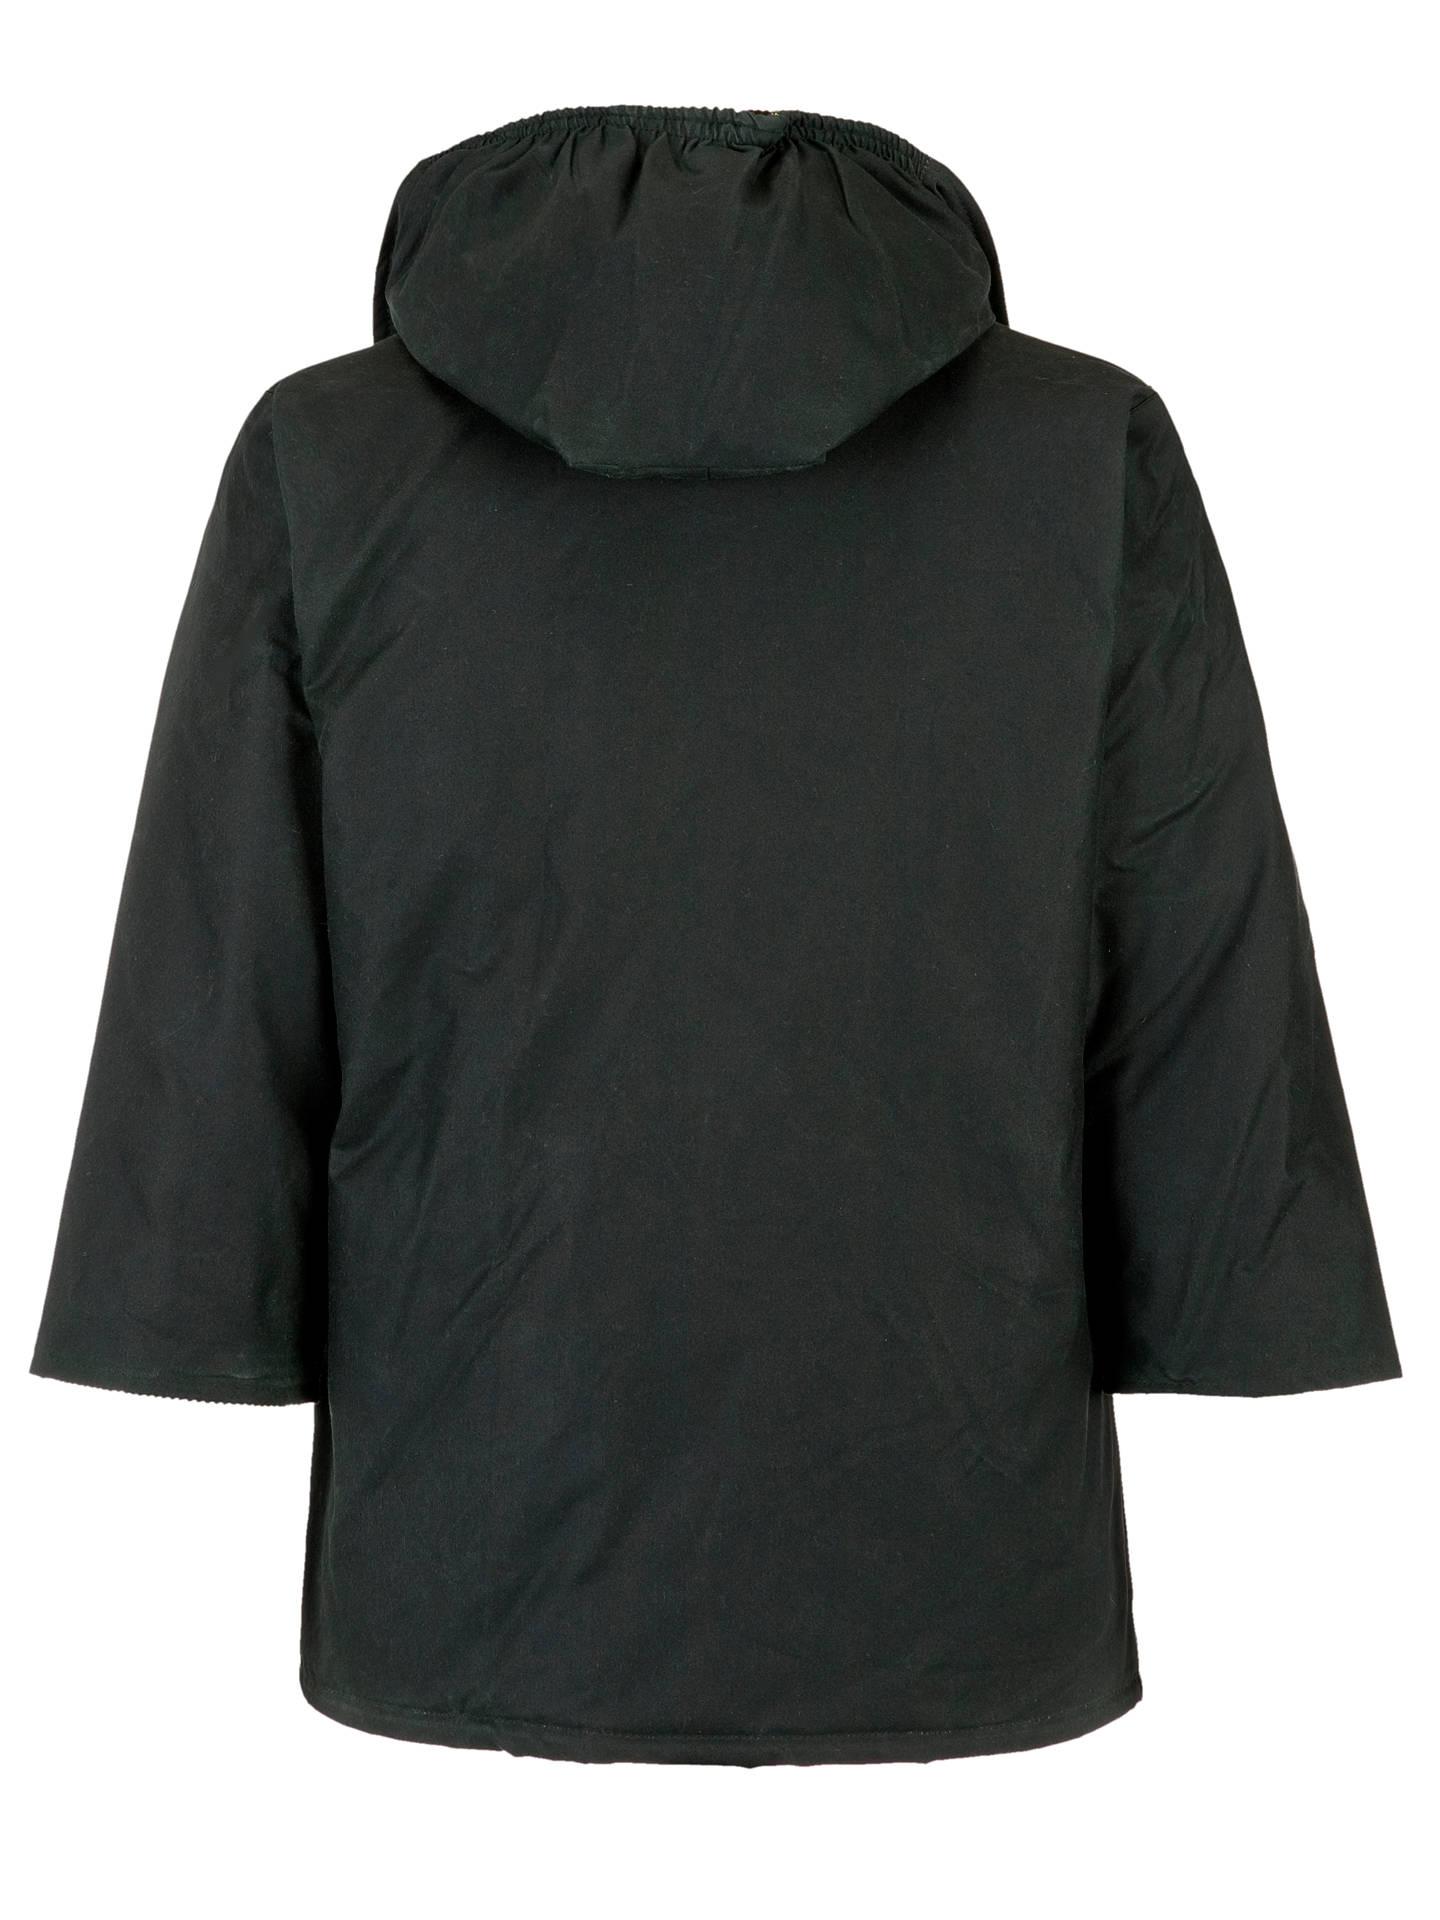 882807d7f John Lewis   Partners Children s Wax Jacket